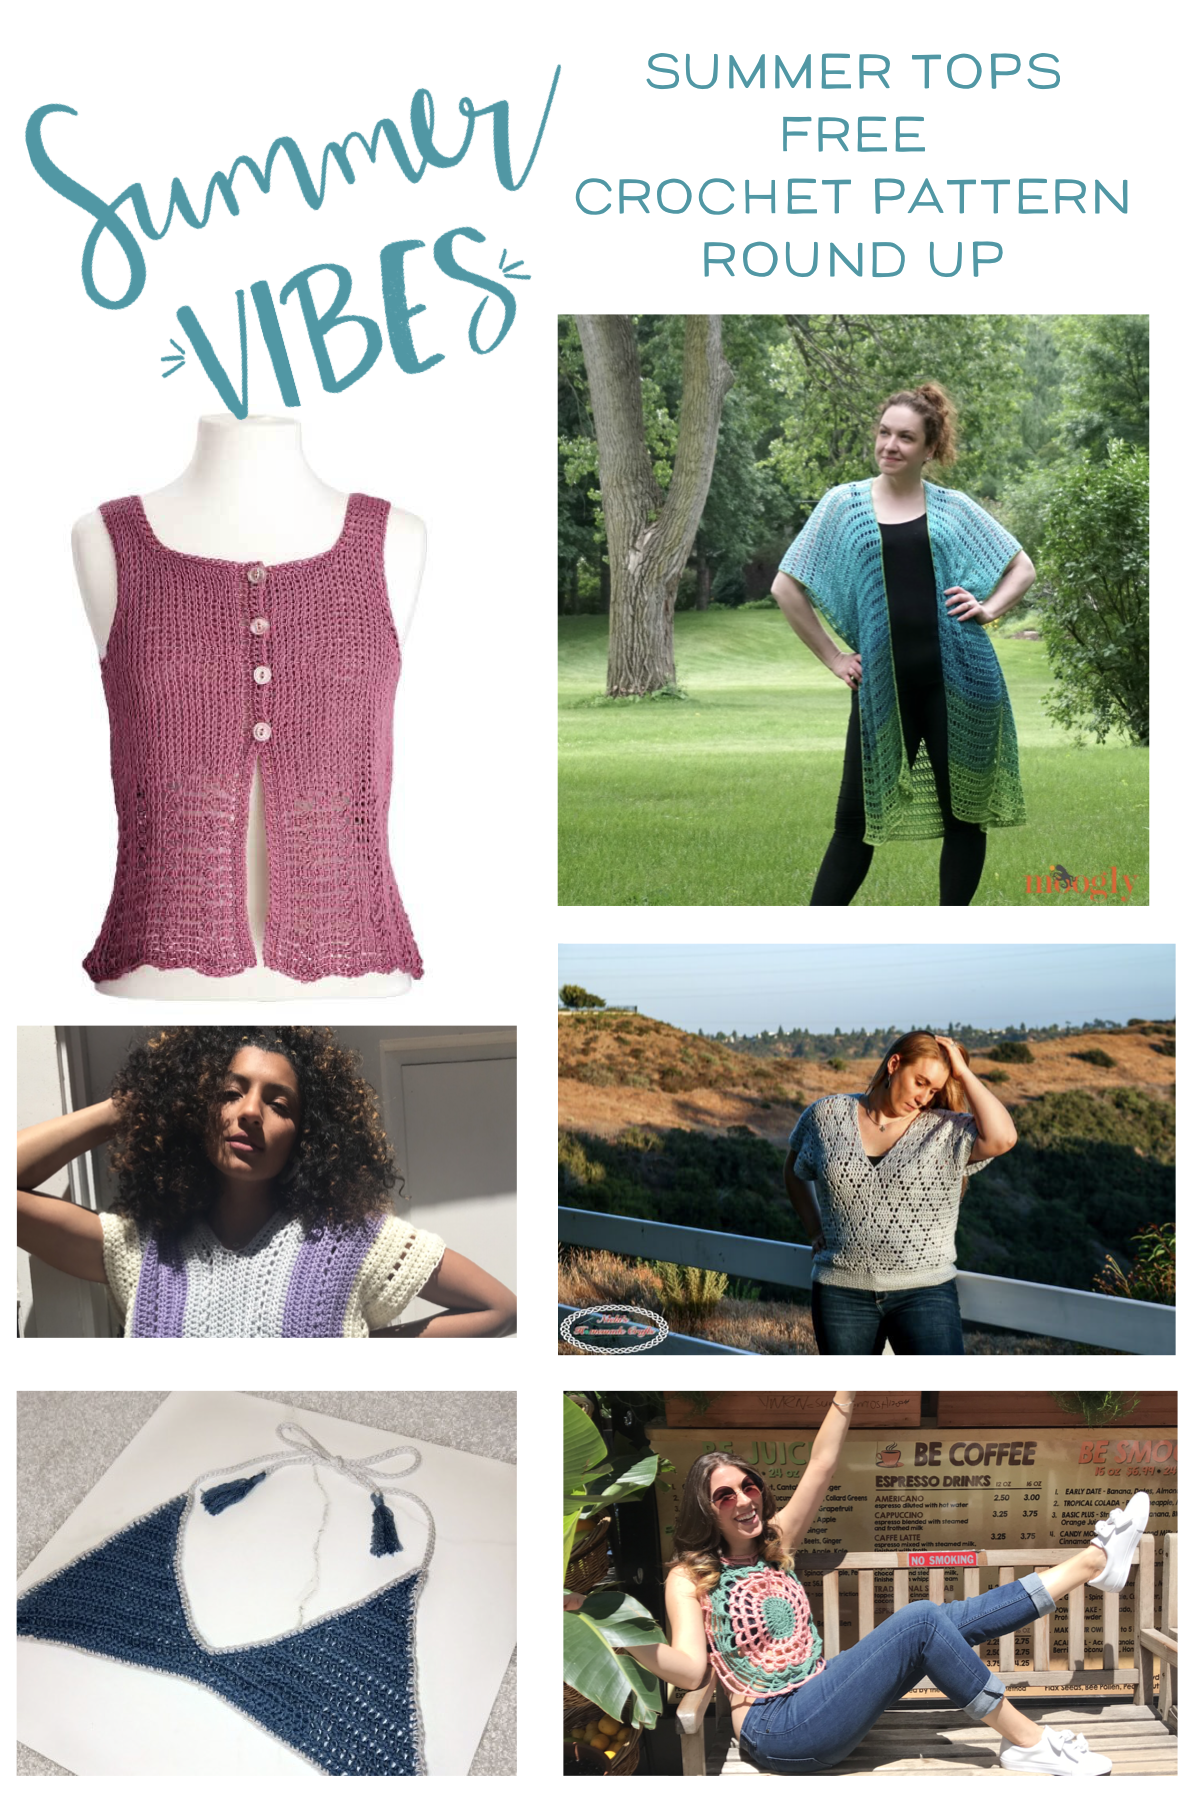 summer-festival-tops-free-crochet-pattern-round-up.jpeg